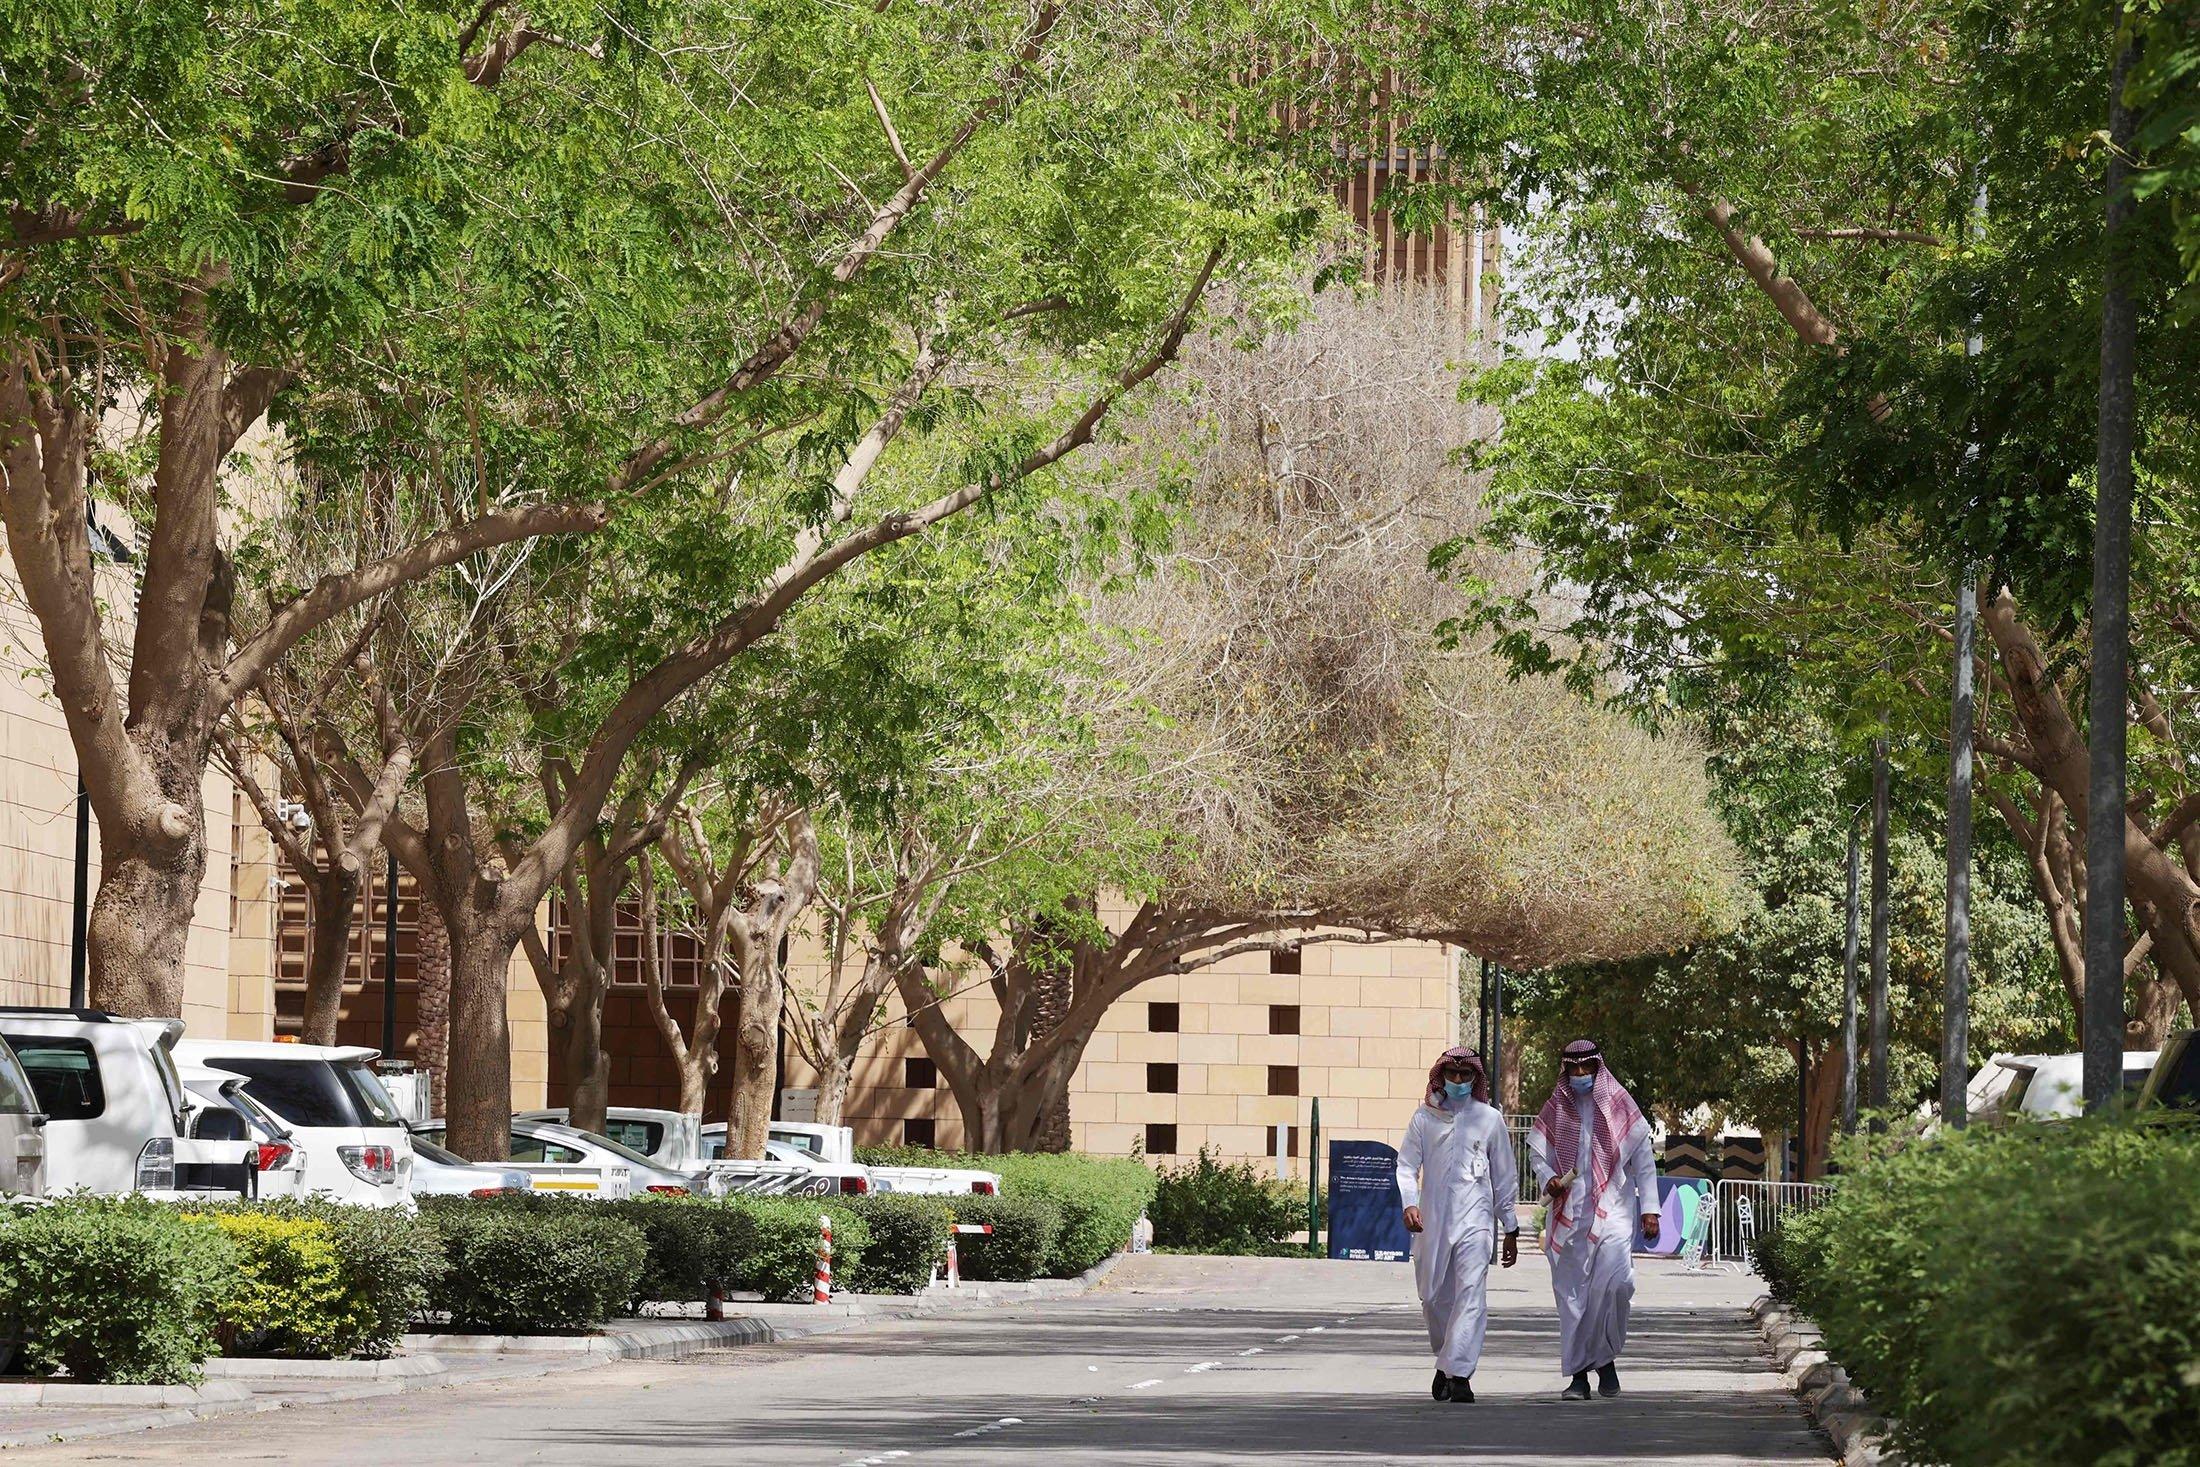 People walk on a tree-lined lane in the Saudi capital Riyadh, Saudi Arabia, March 29, 2021. (AFP Photo)